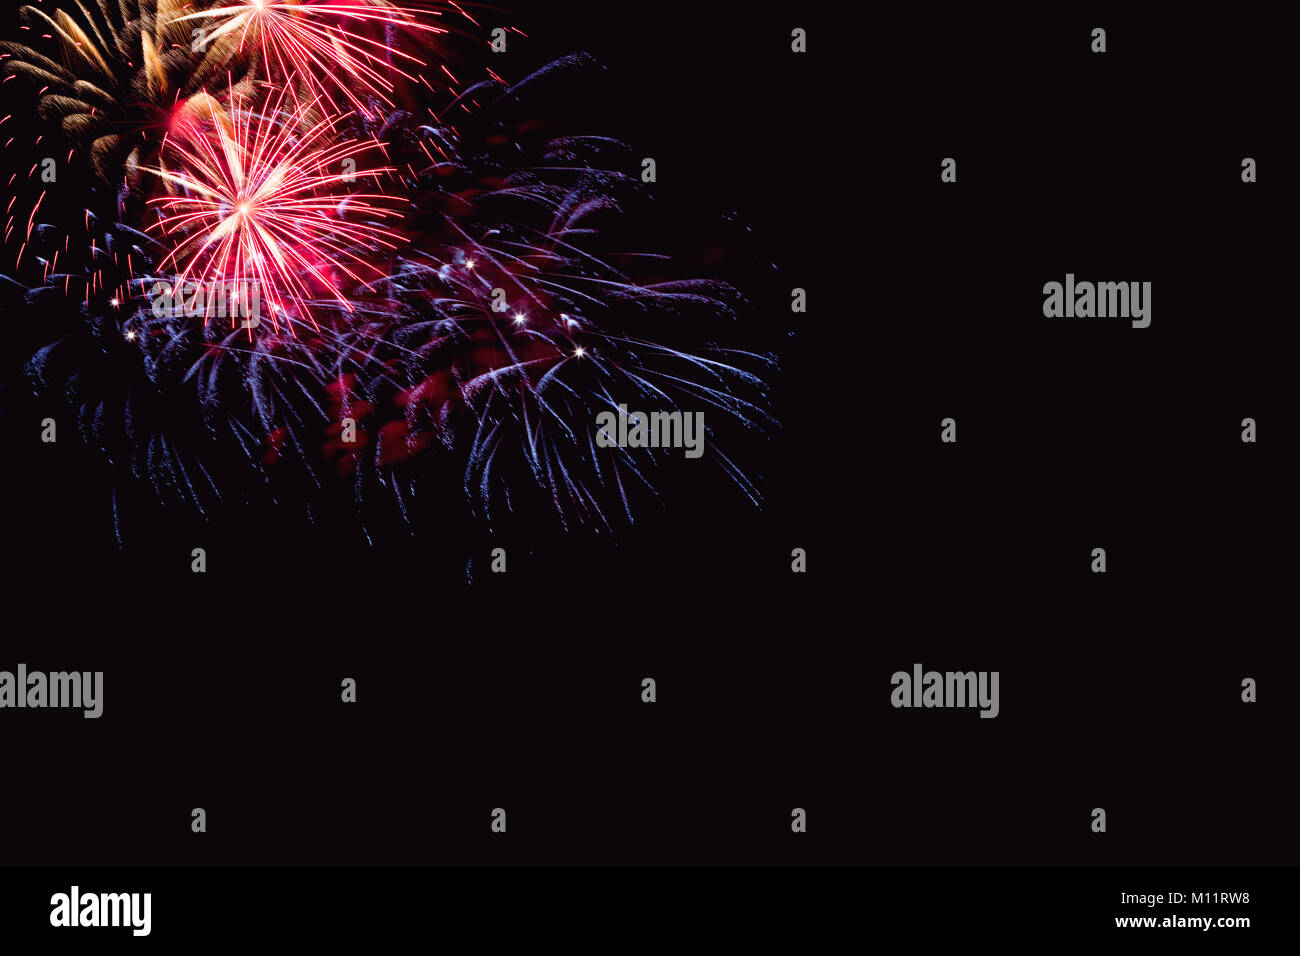 Rainbow Fireworks Celebration Colorful Abstract Image With: Colour Smoke White Background Stock Photos & Colour Smoke